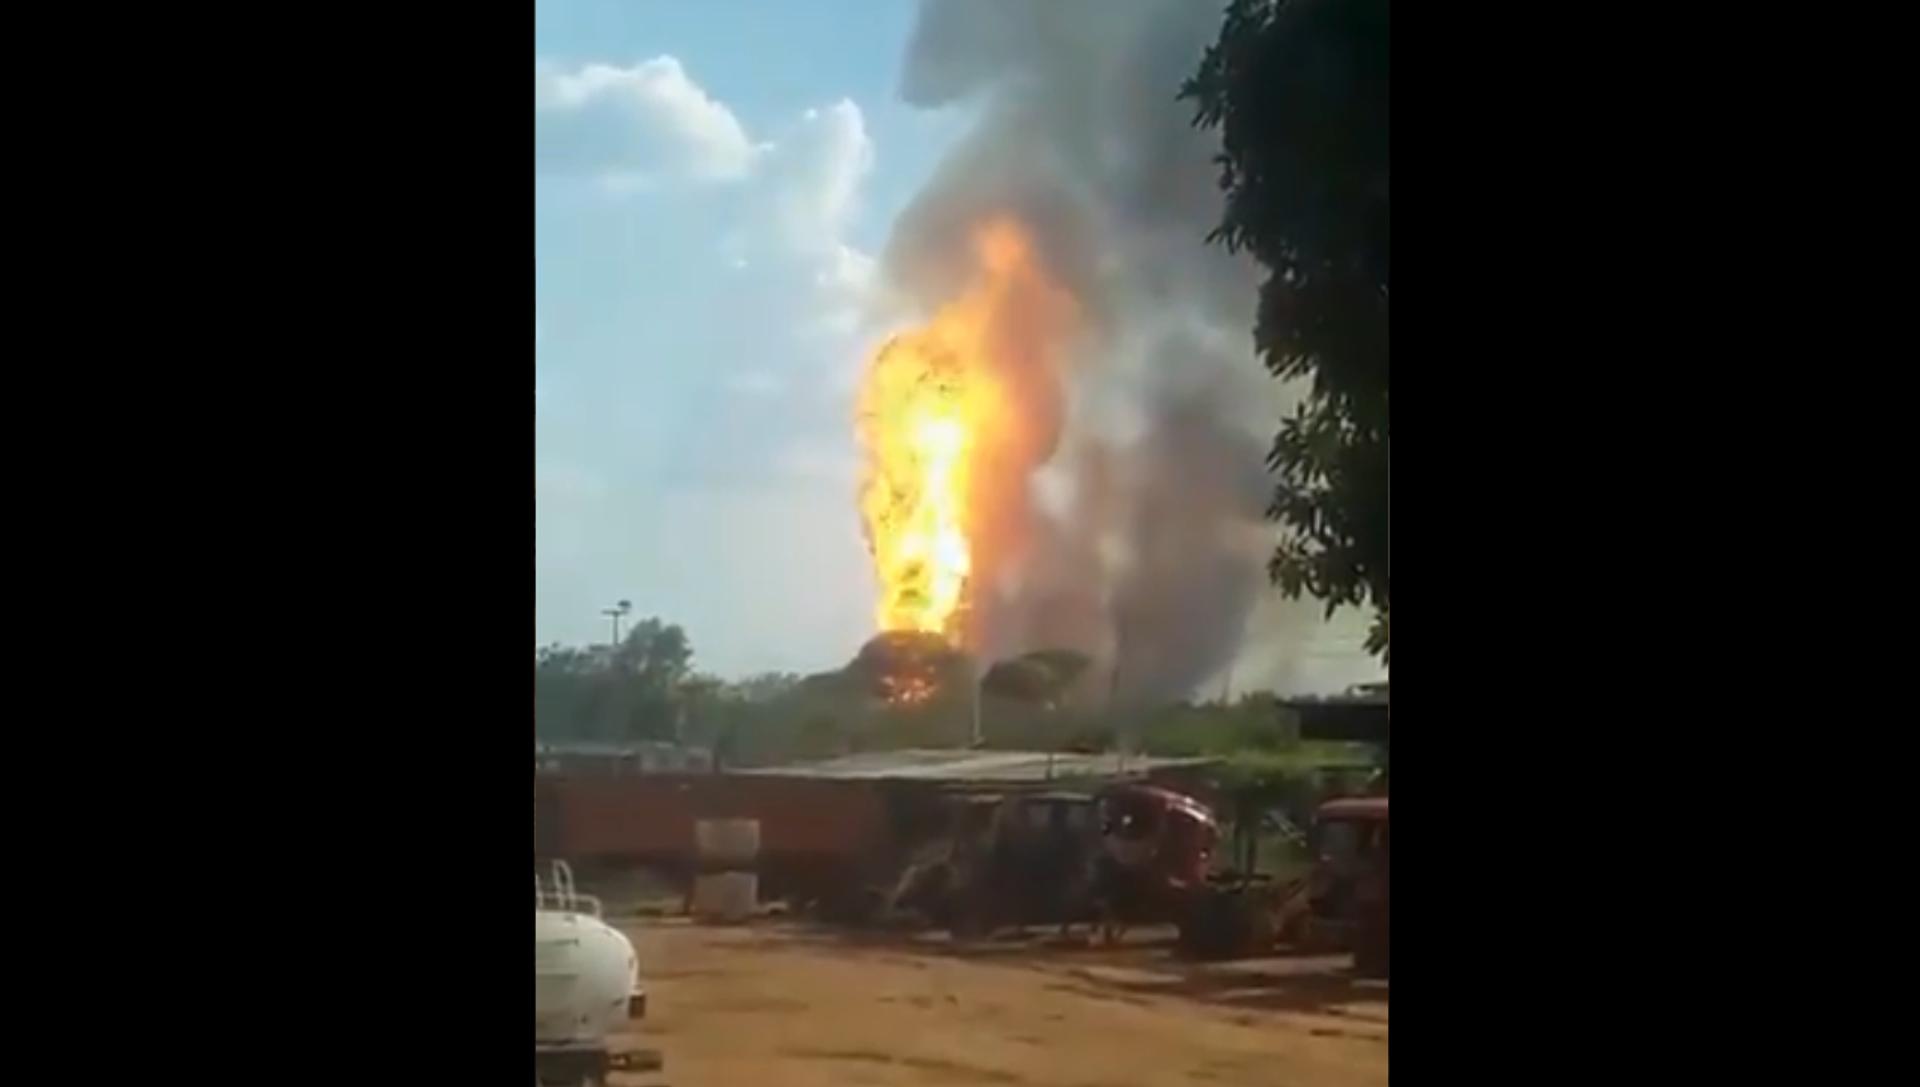 Esplosione in gasdotto venezuelano - Sputnik Italia, 1920, 21.03.2021